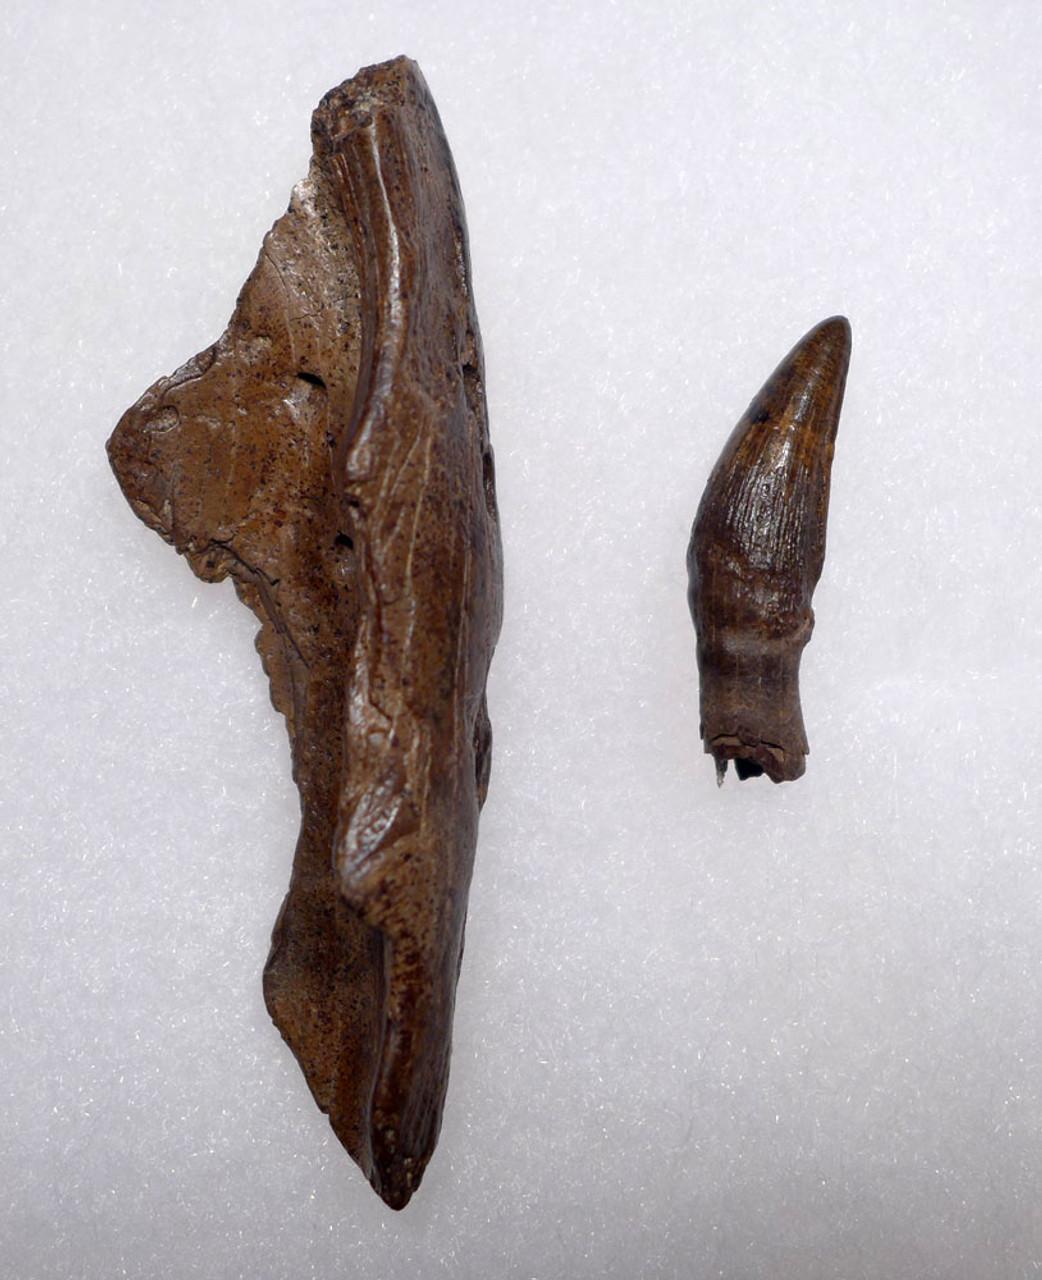 DINOSAUR-ERA FOSSIL LEIDYOSUCHUS CROCODILE TOOTH WITH JAW FRAGMENT FROM HELL CREEK  *CROC086